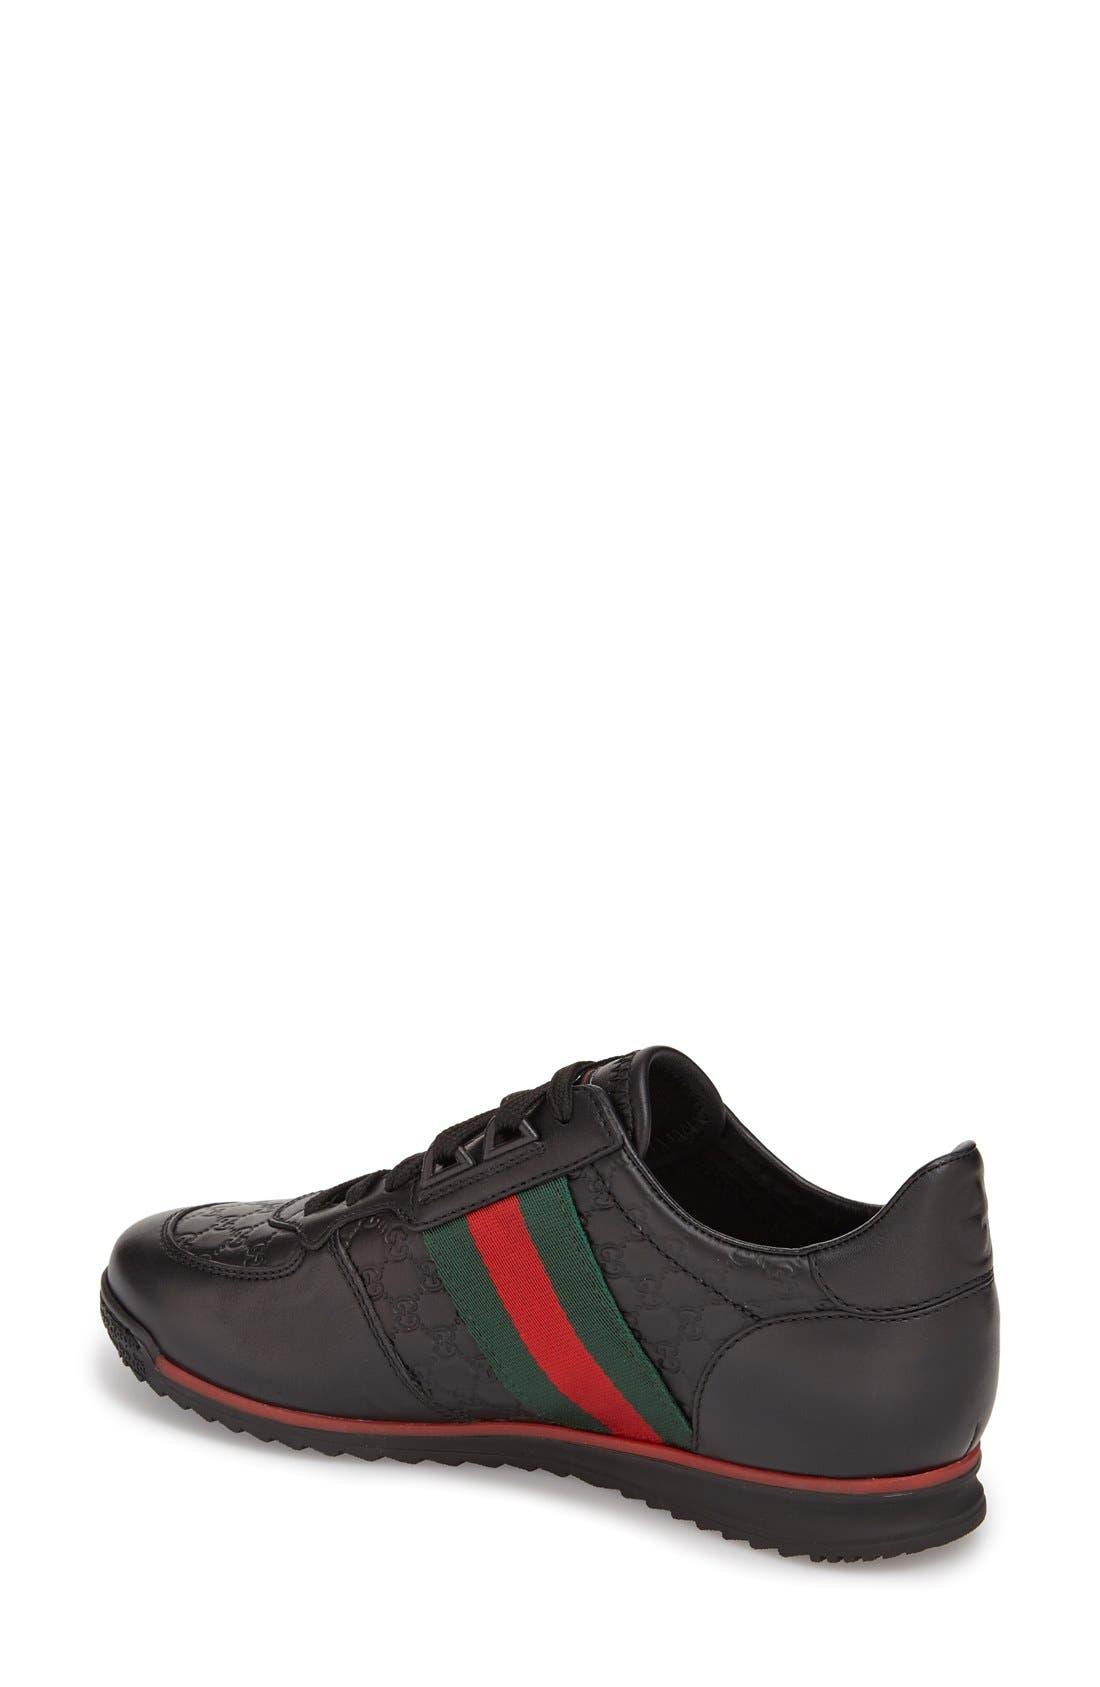 Alternate Image 2  - Gucci 'SL73' Sneaker (Women)